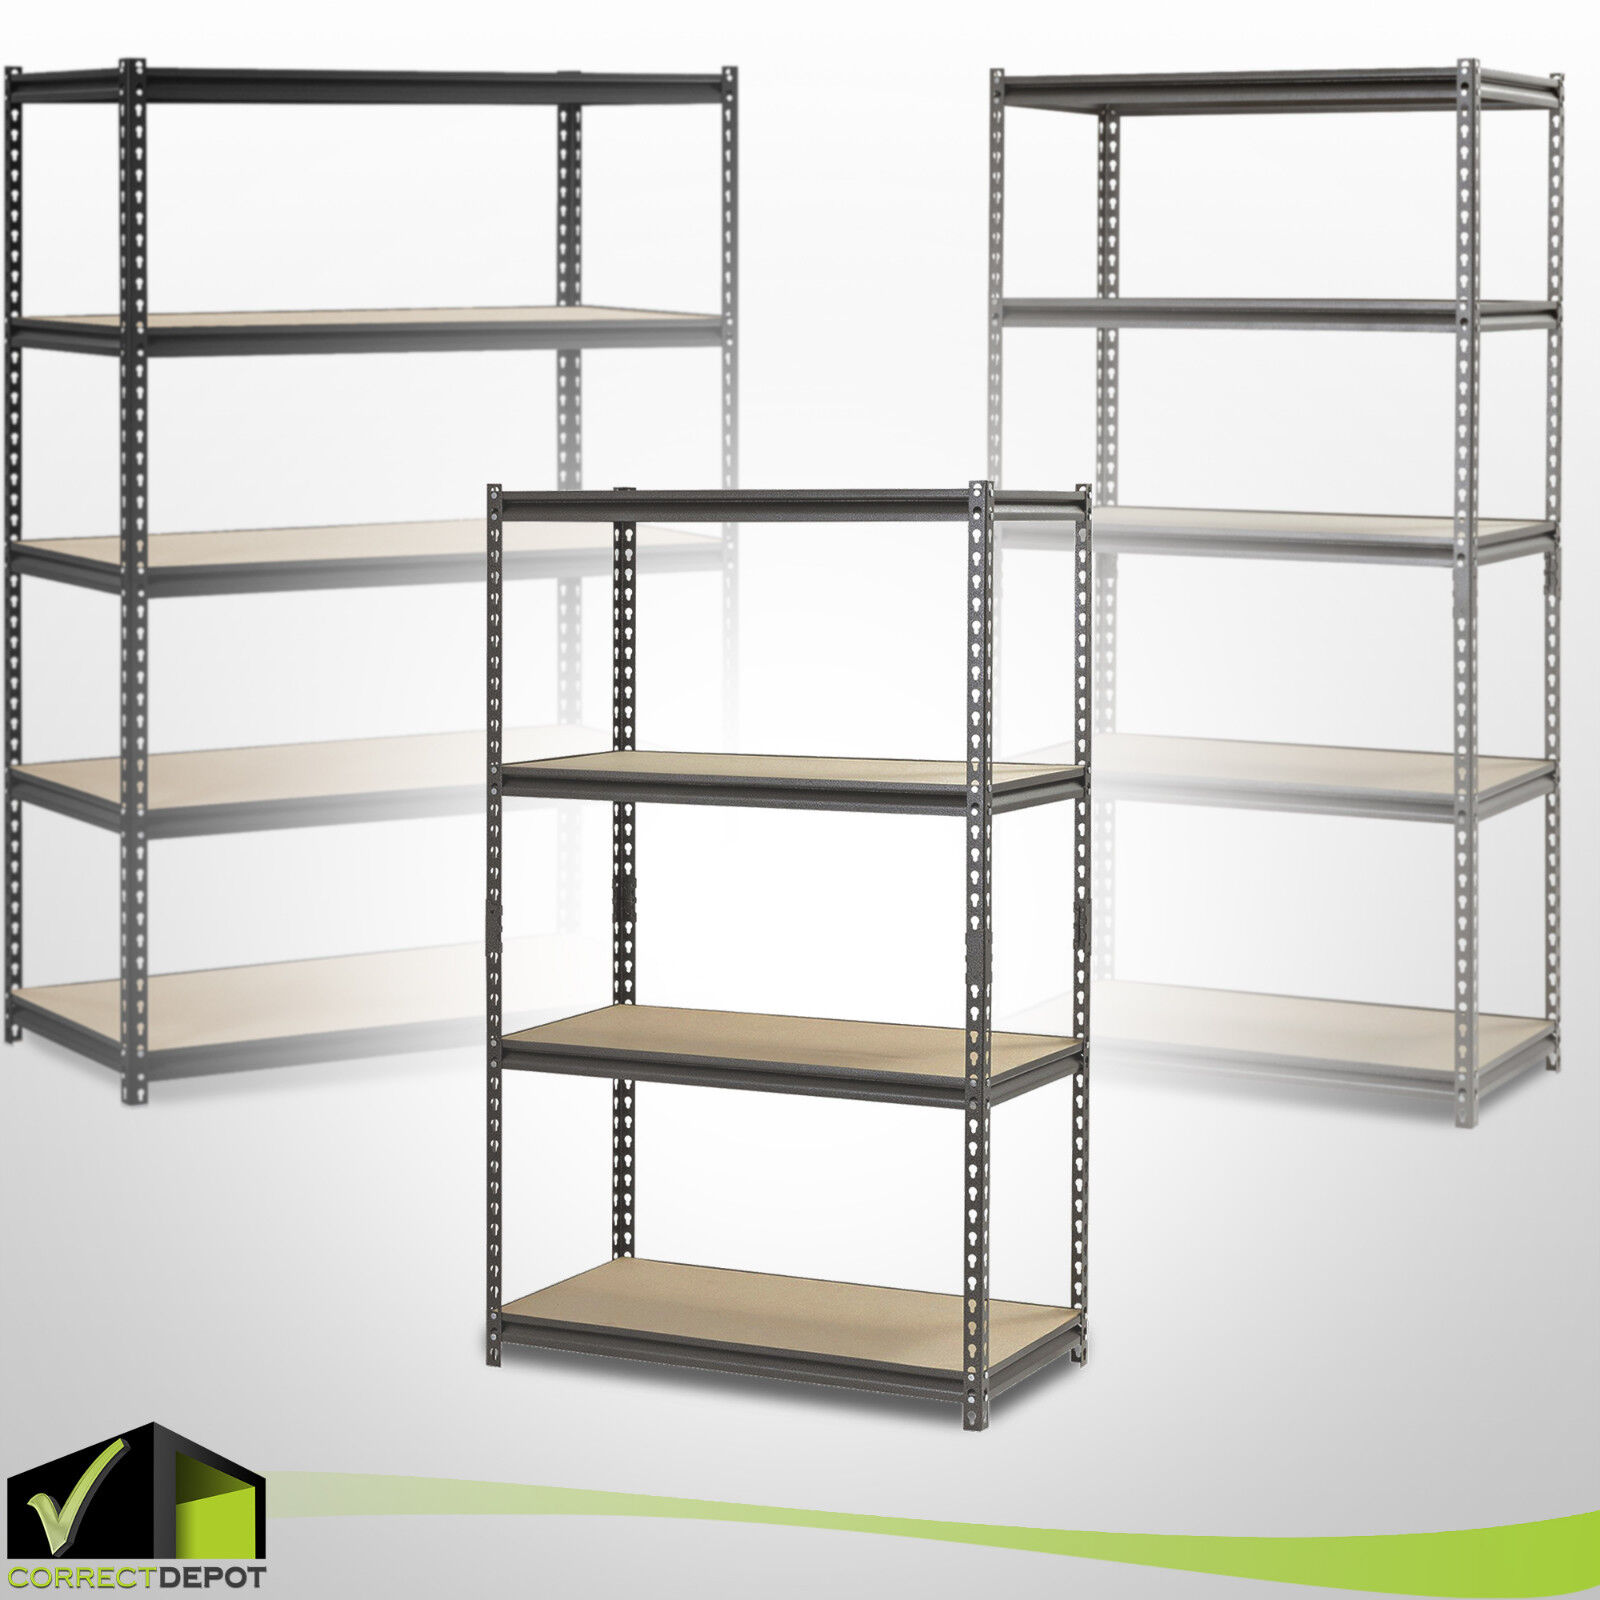 Heavy Duty Muscle Rack Adjustable Steel Storage Metal Shelves 4 5 Levels Units